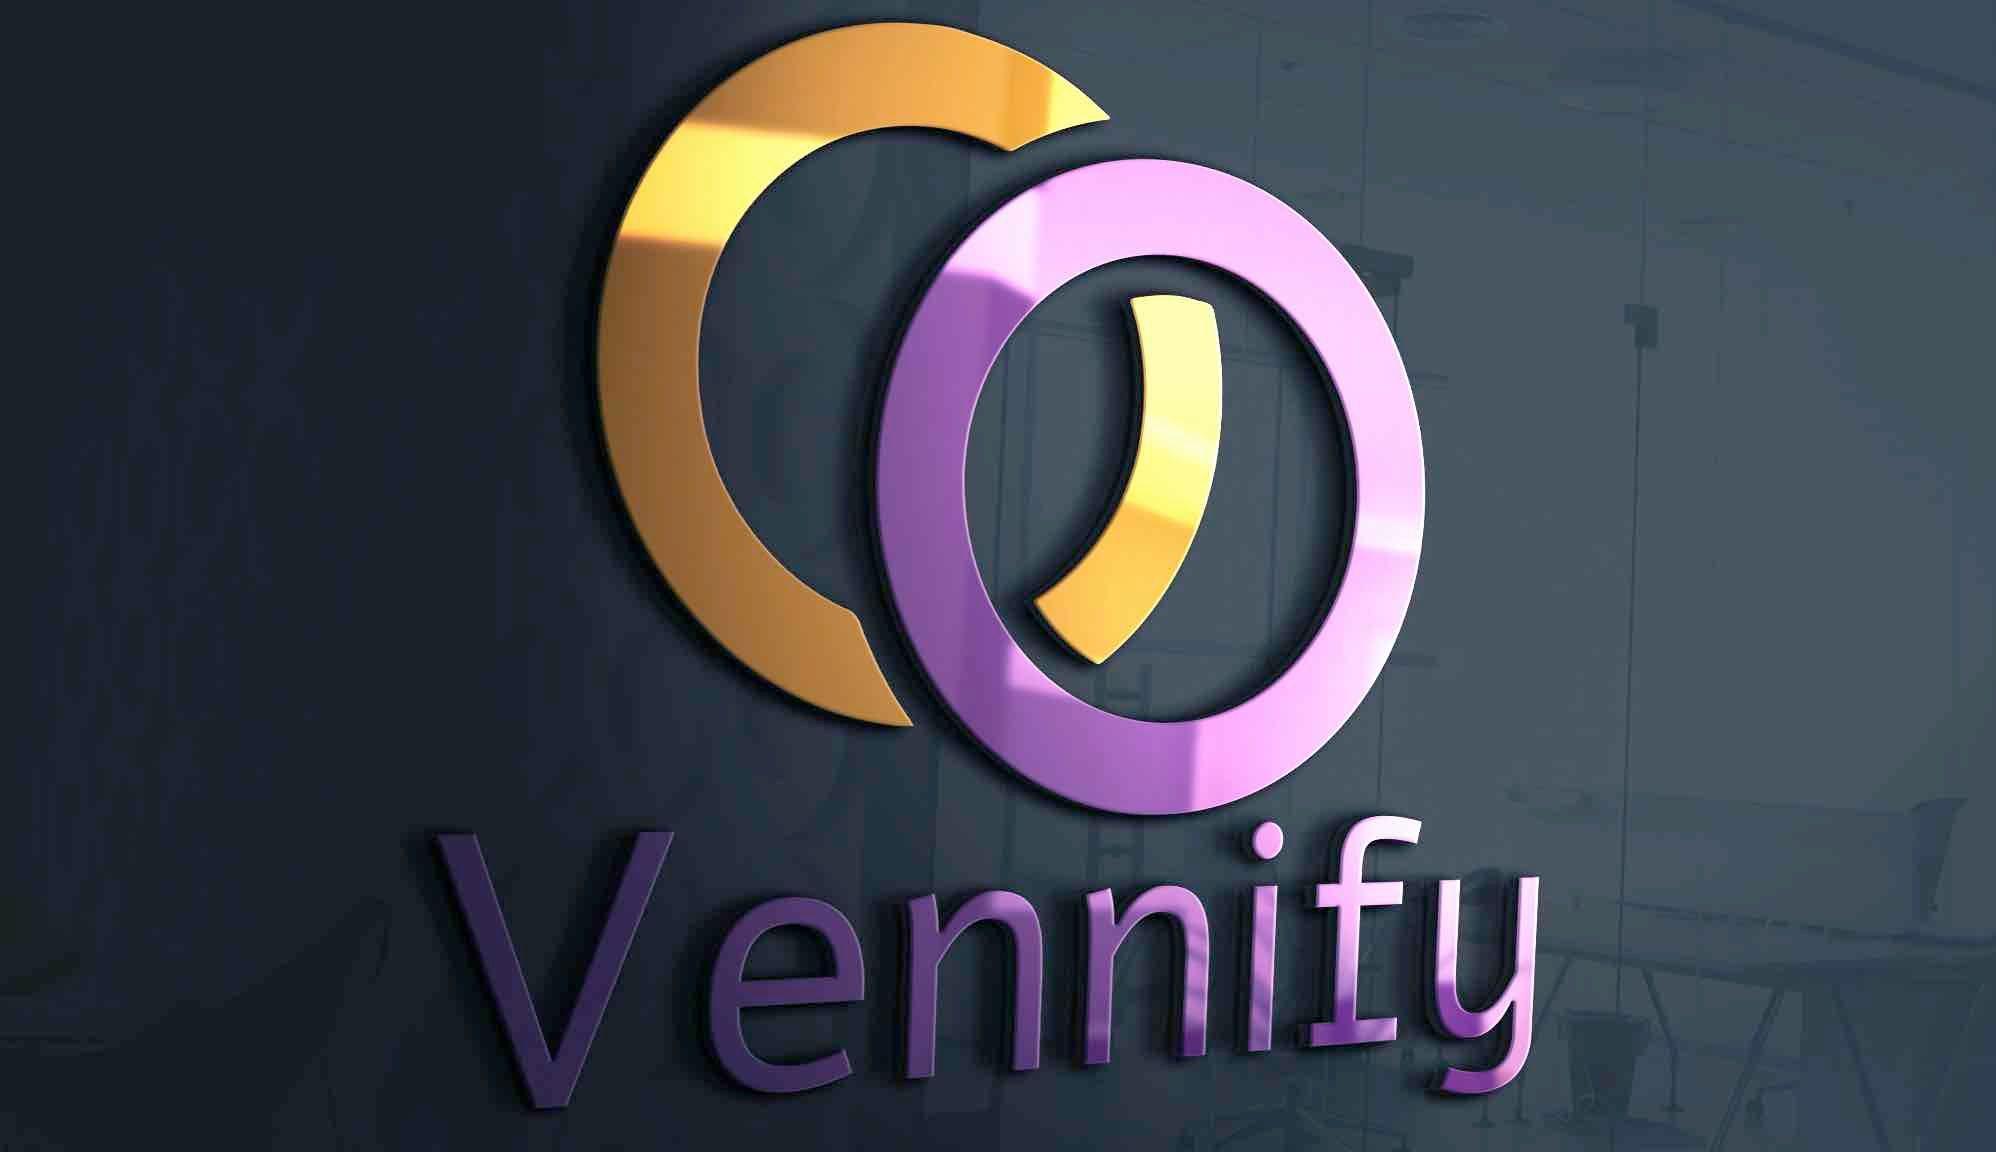 Vennify Inc